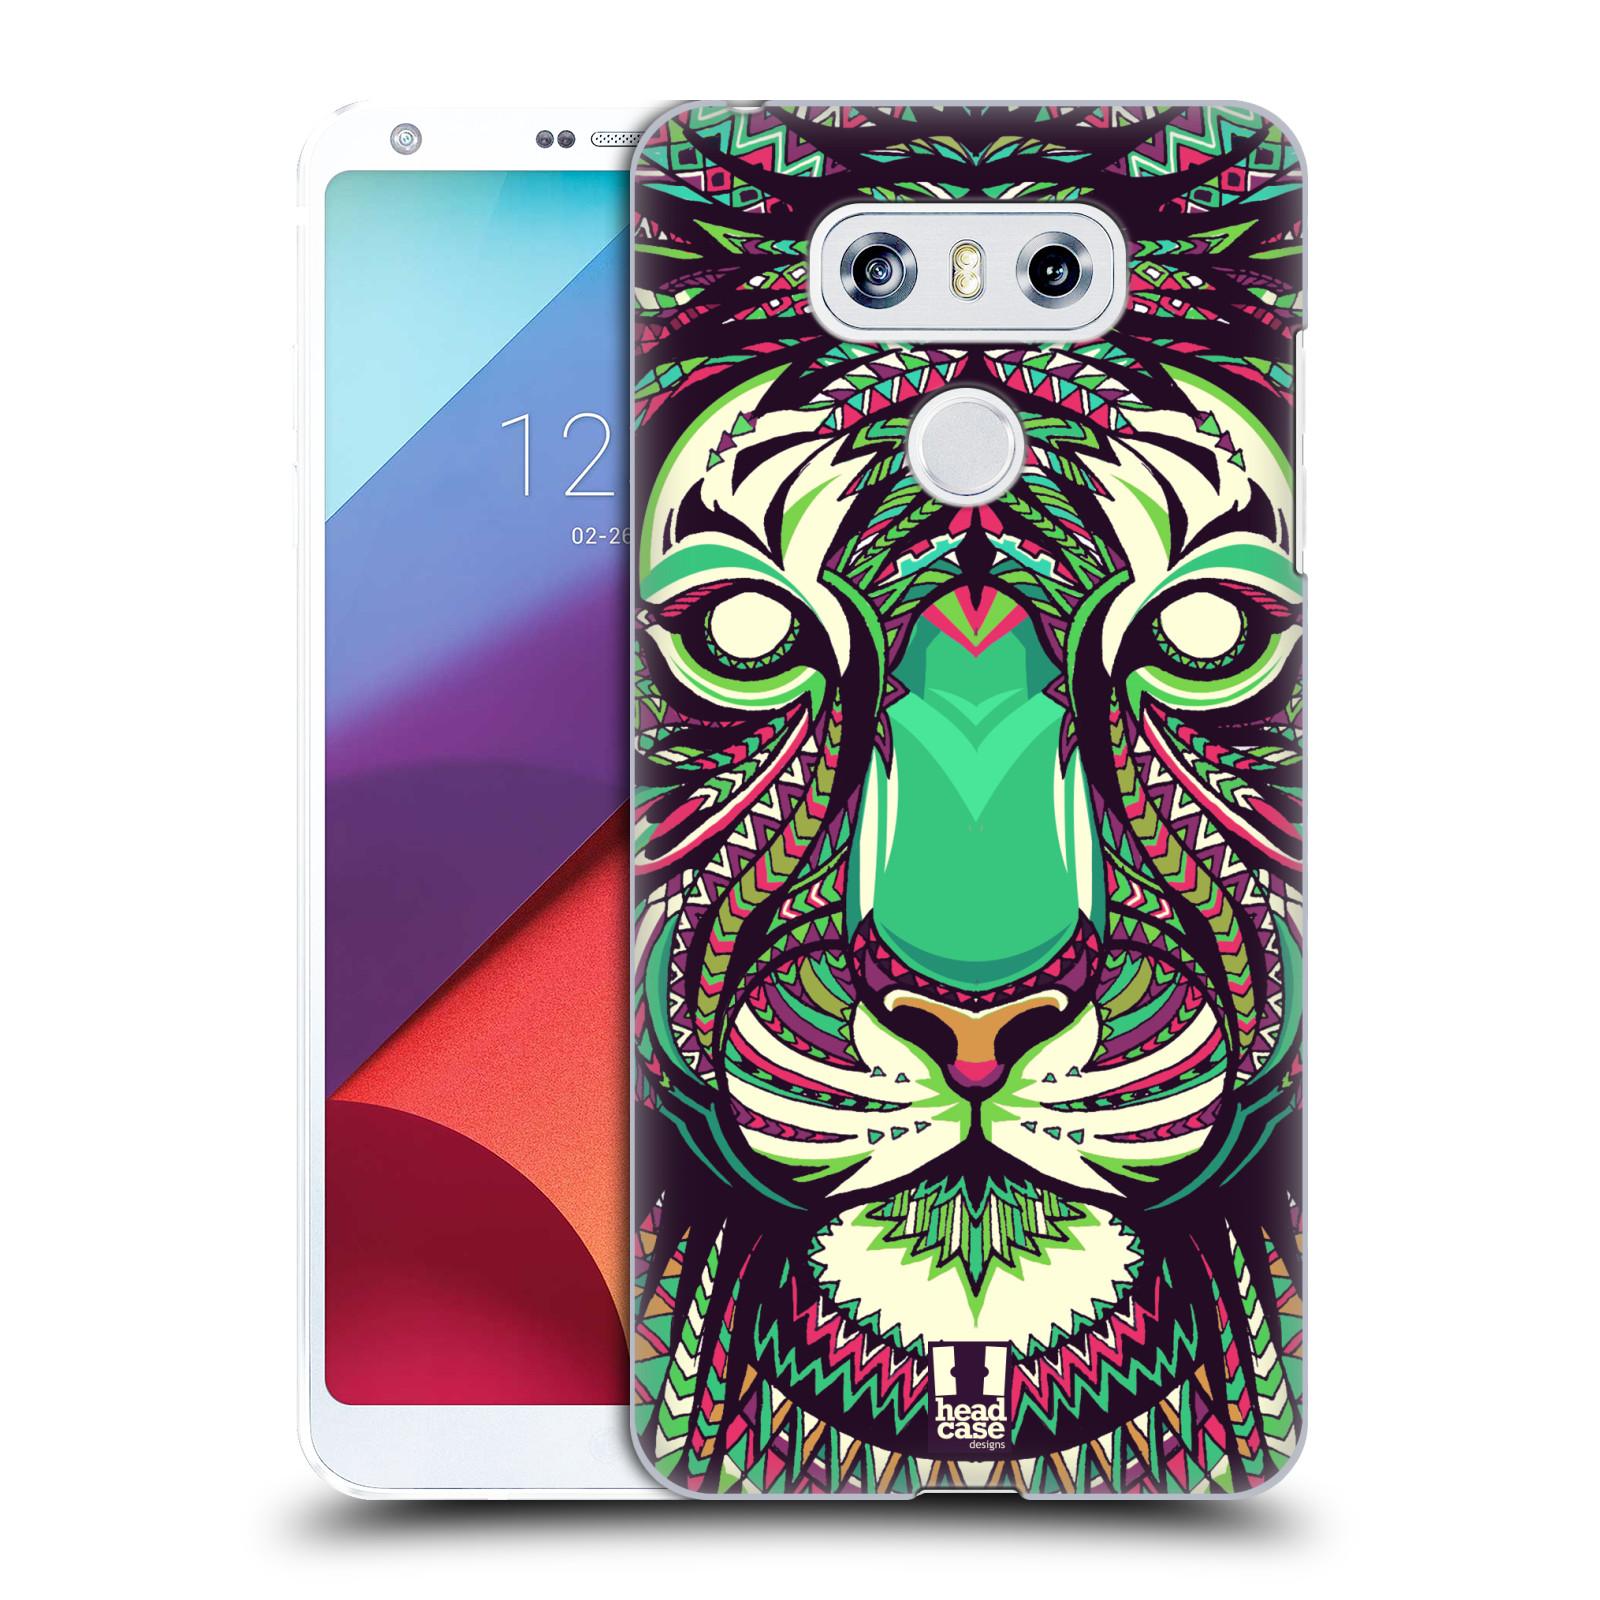 Plastové pouzdro na mobil LG G6 - Head Case AZTEC TYGR